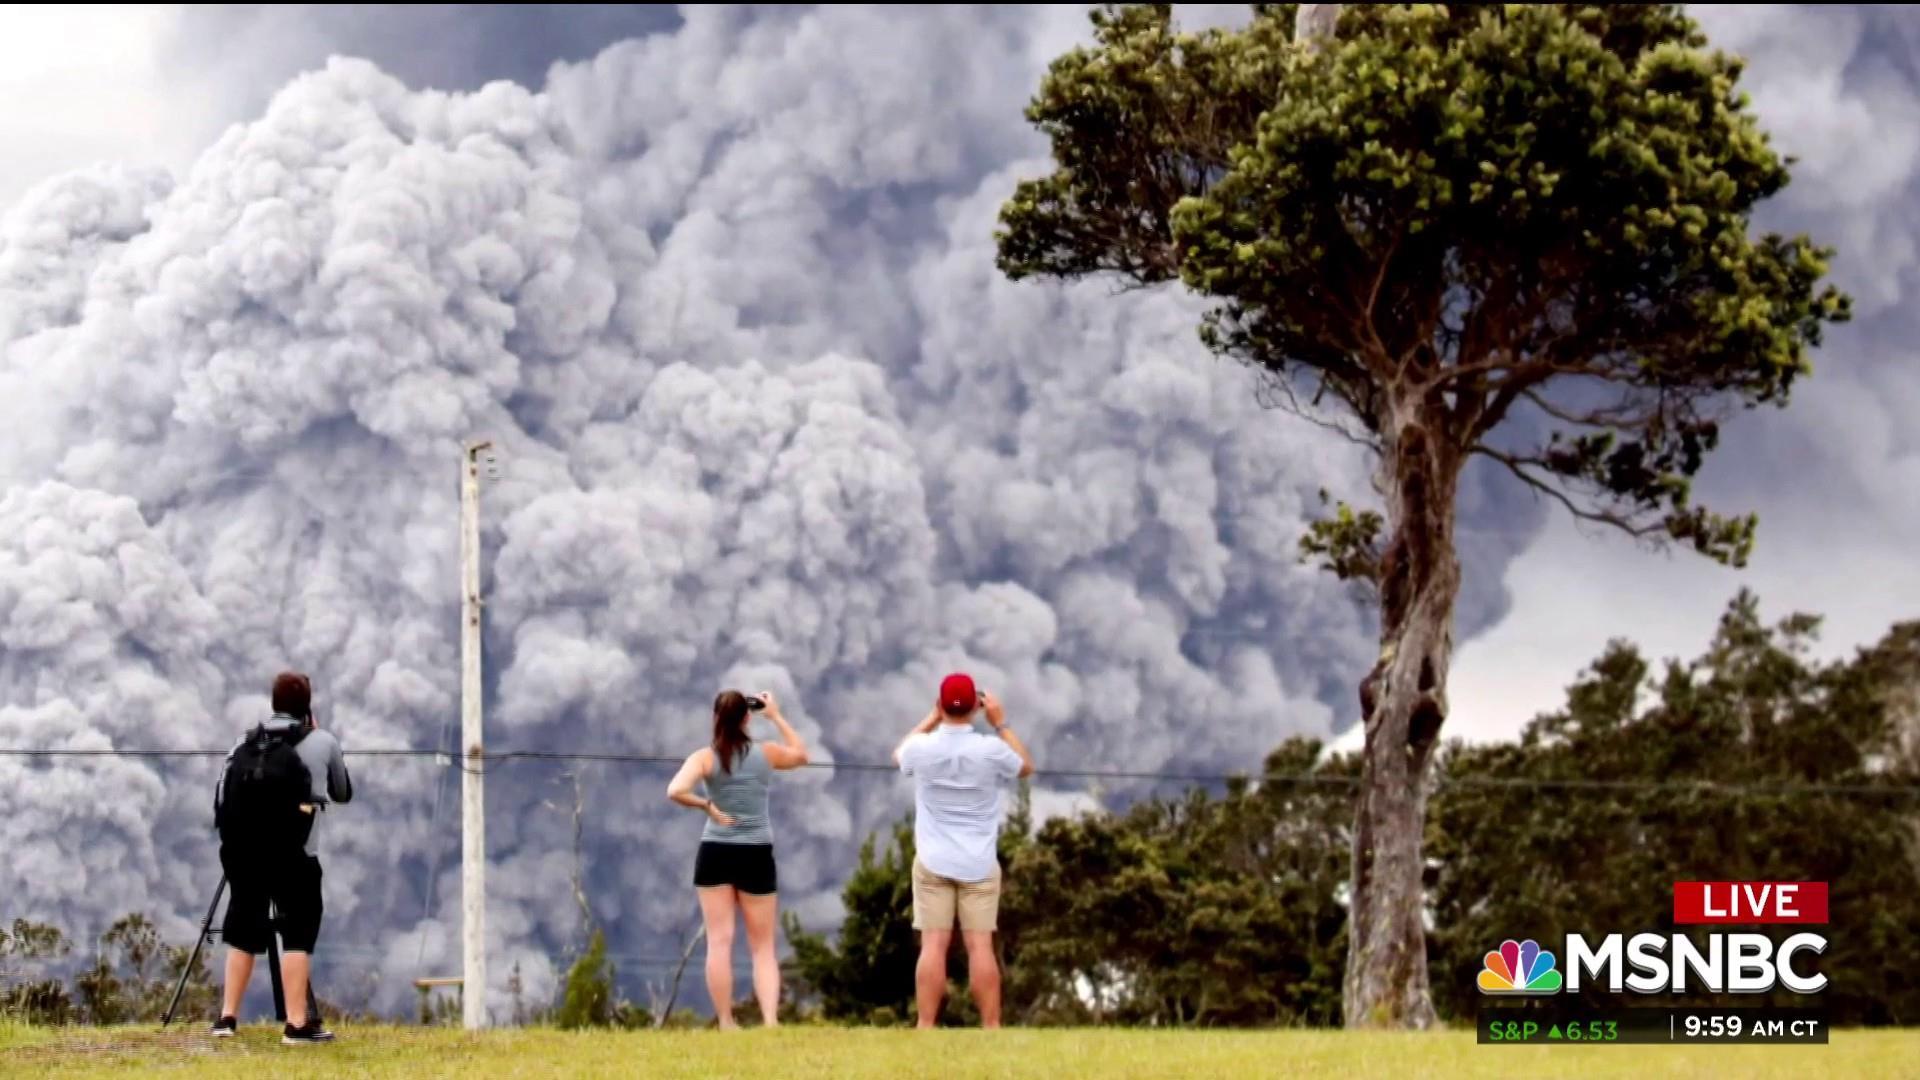 #BIGPICTURE: Ash erupts near the Kilauea Volcano in Hawaii